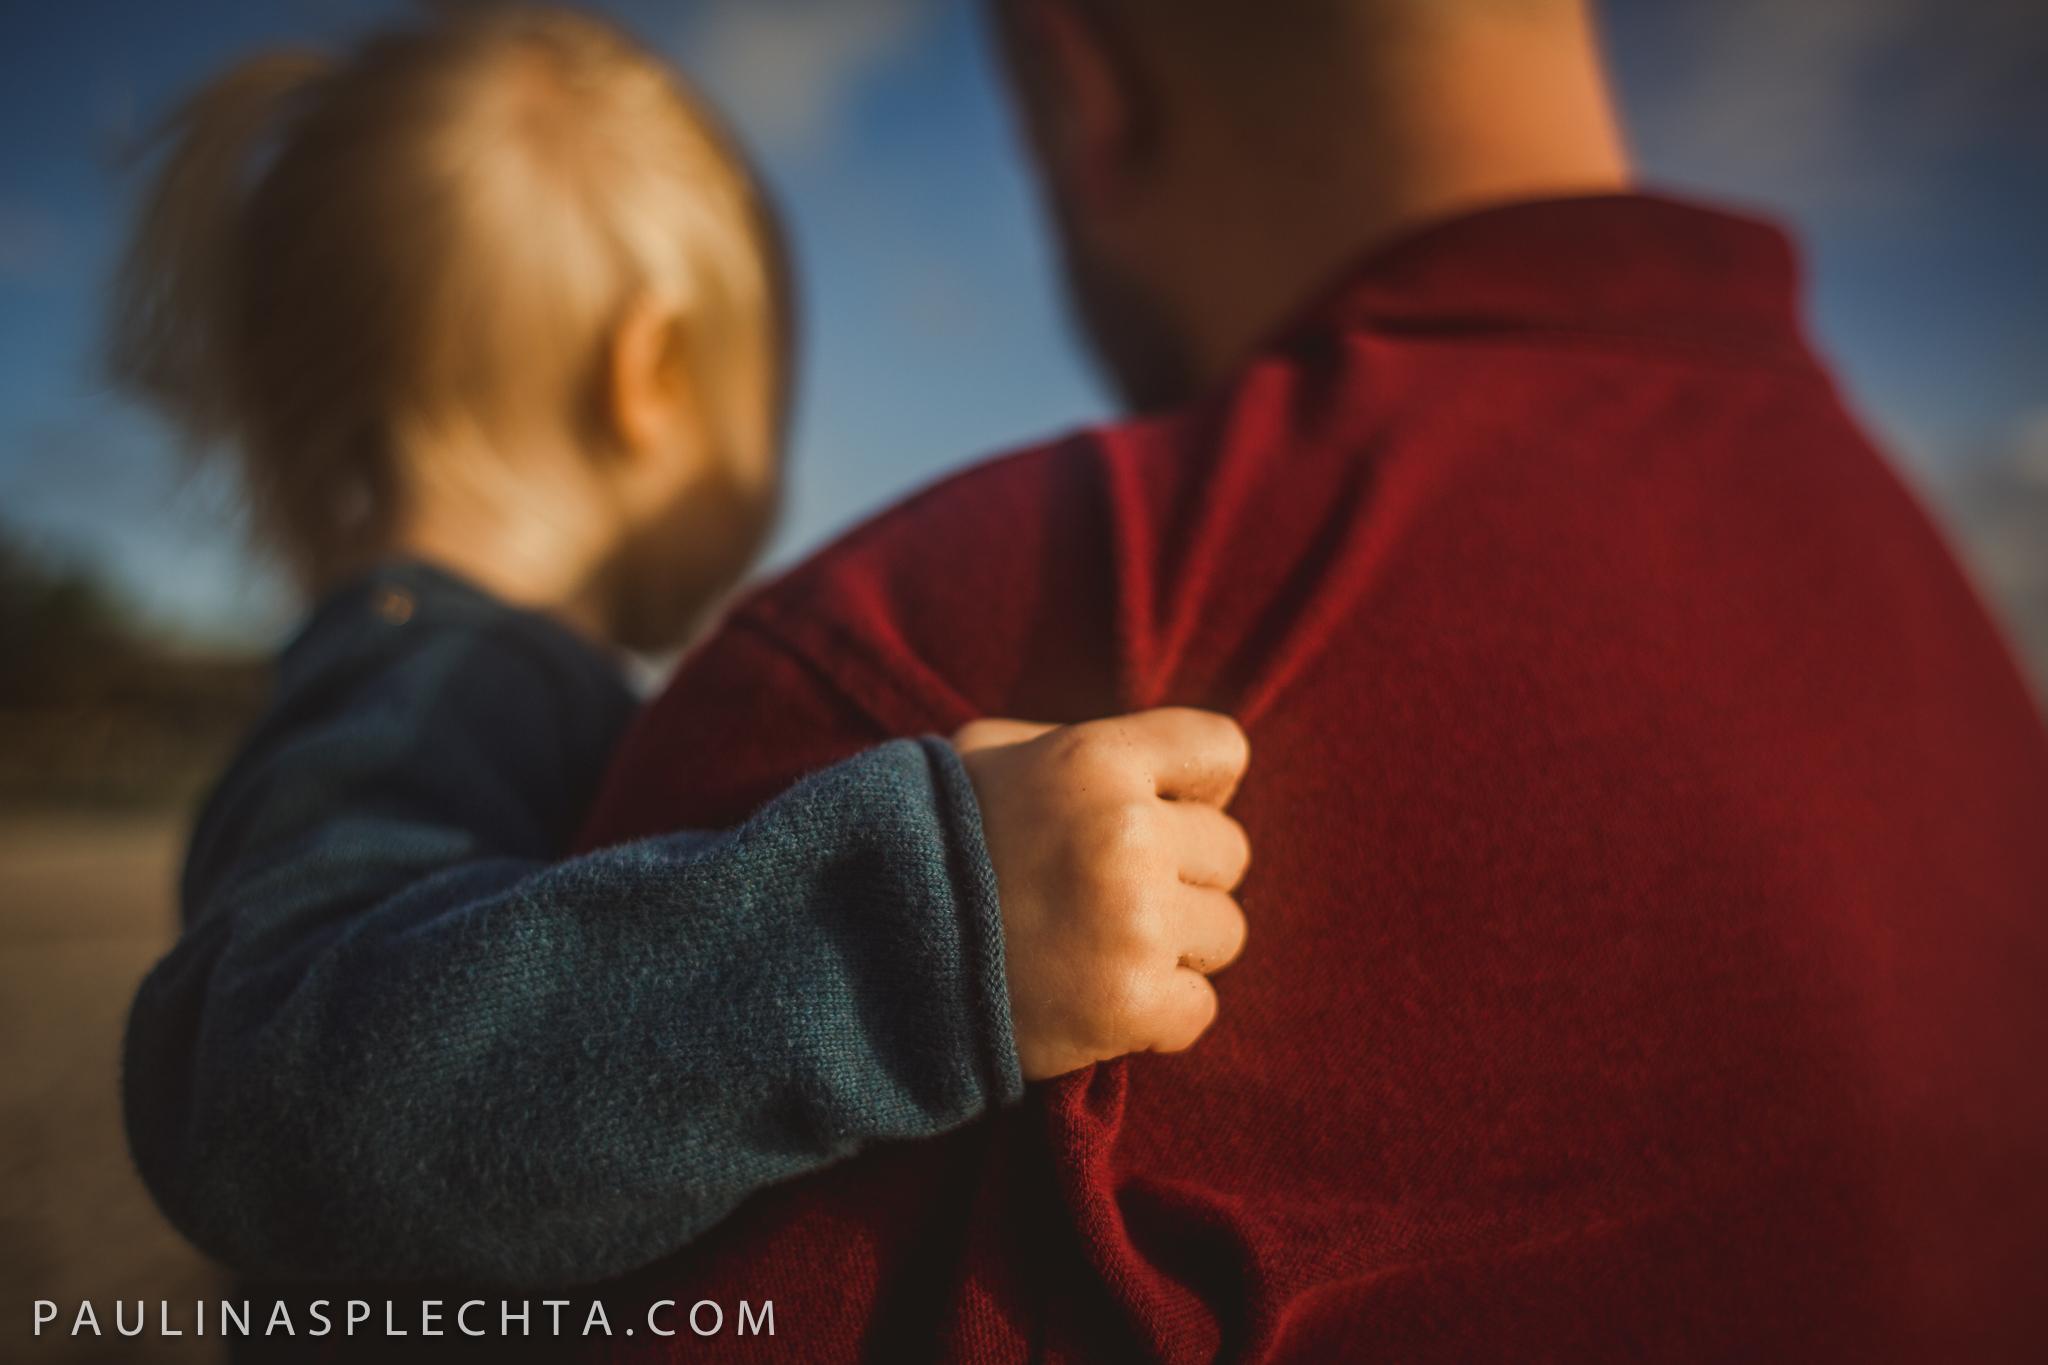 Family Photographer South Florida Pompano Broward Palm Beach Babies Baby Newborn Breastfeeding Birth Photograpy Beach Home Documentary Session-132.jpg